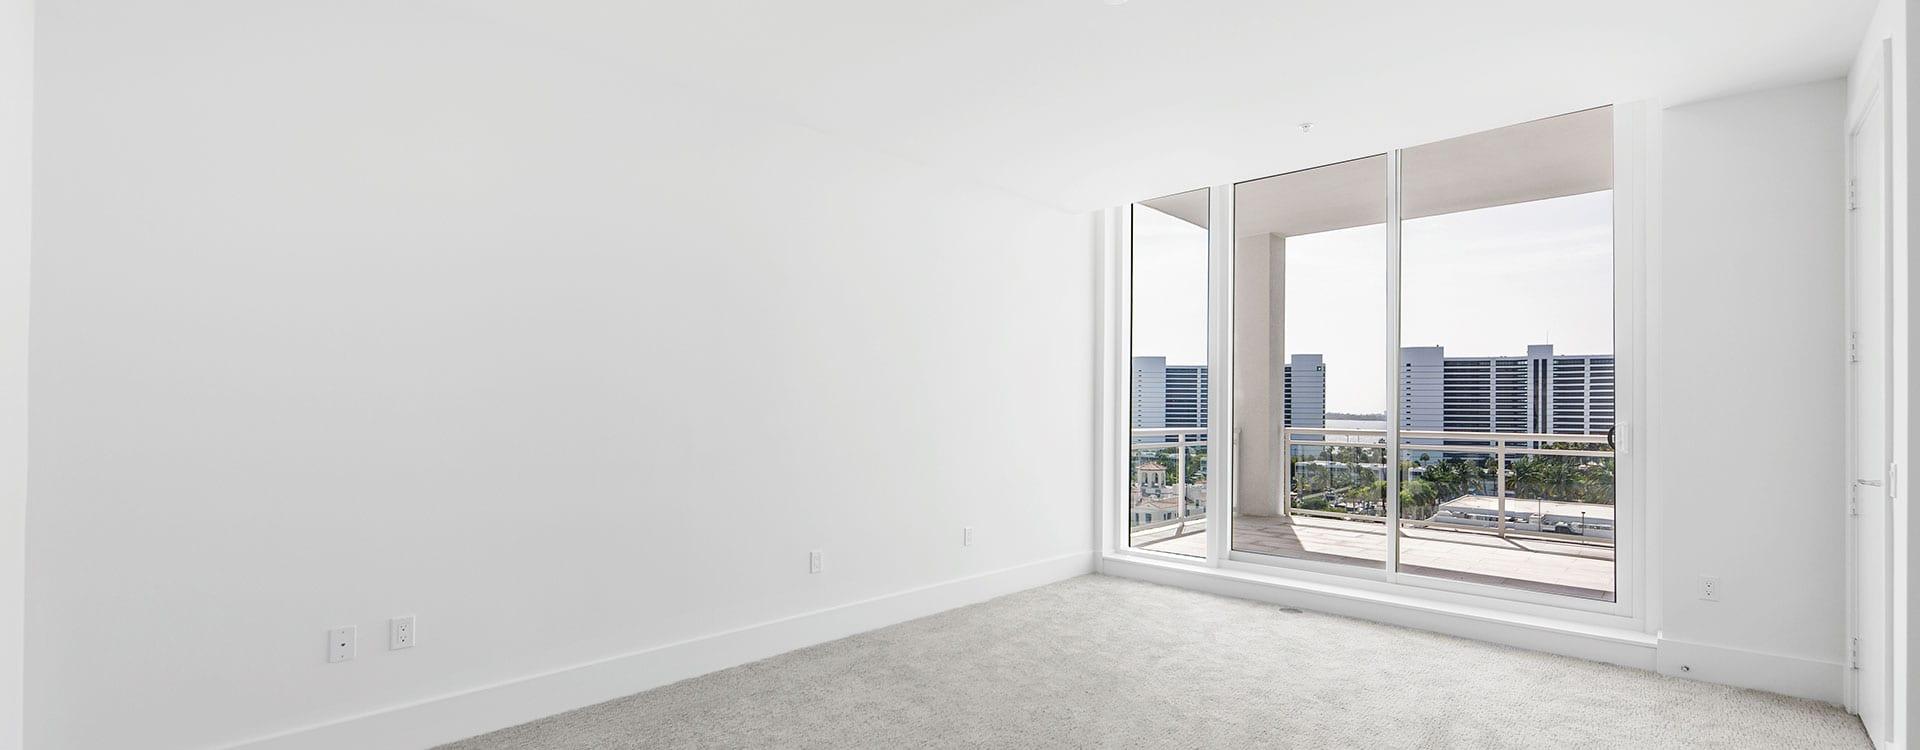 BLVD Sarasota Residence 803 Bedroom with terrace